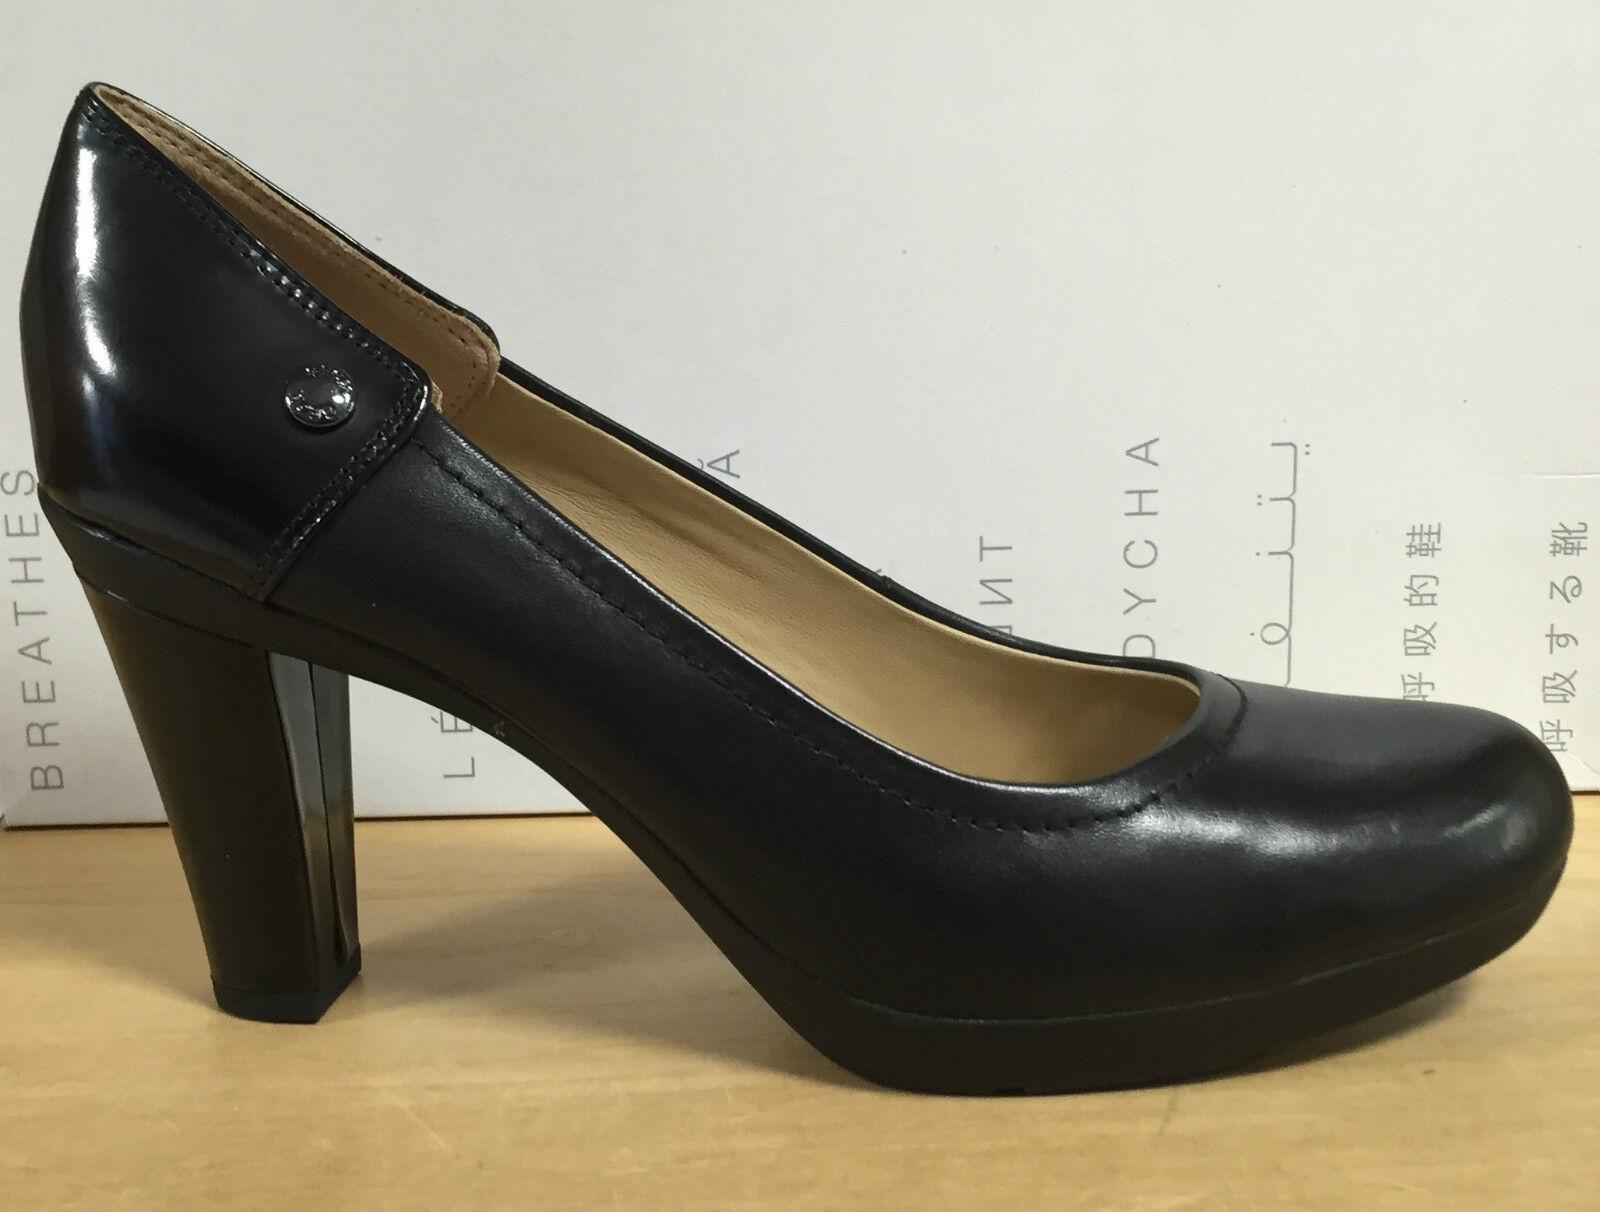 GEOX shoes women DECOLTE' VITELLO black TACCO MEDIO E PLATEAU LINEA INSPIRATION